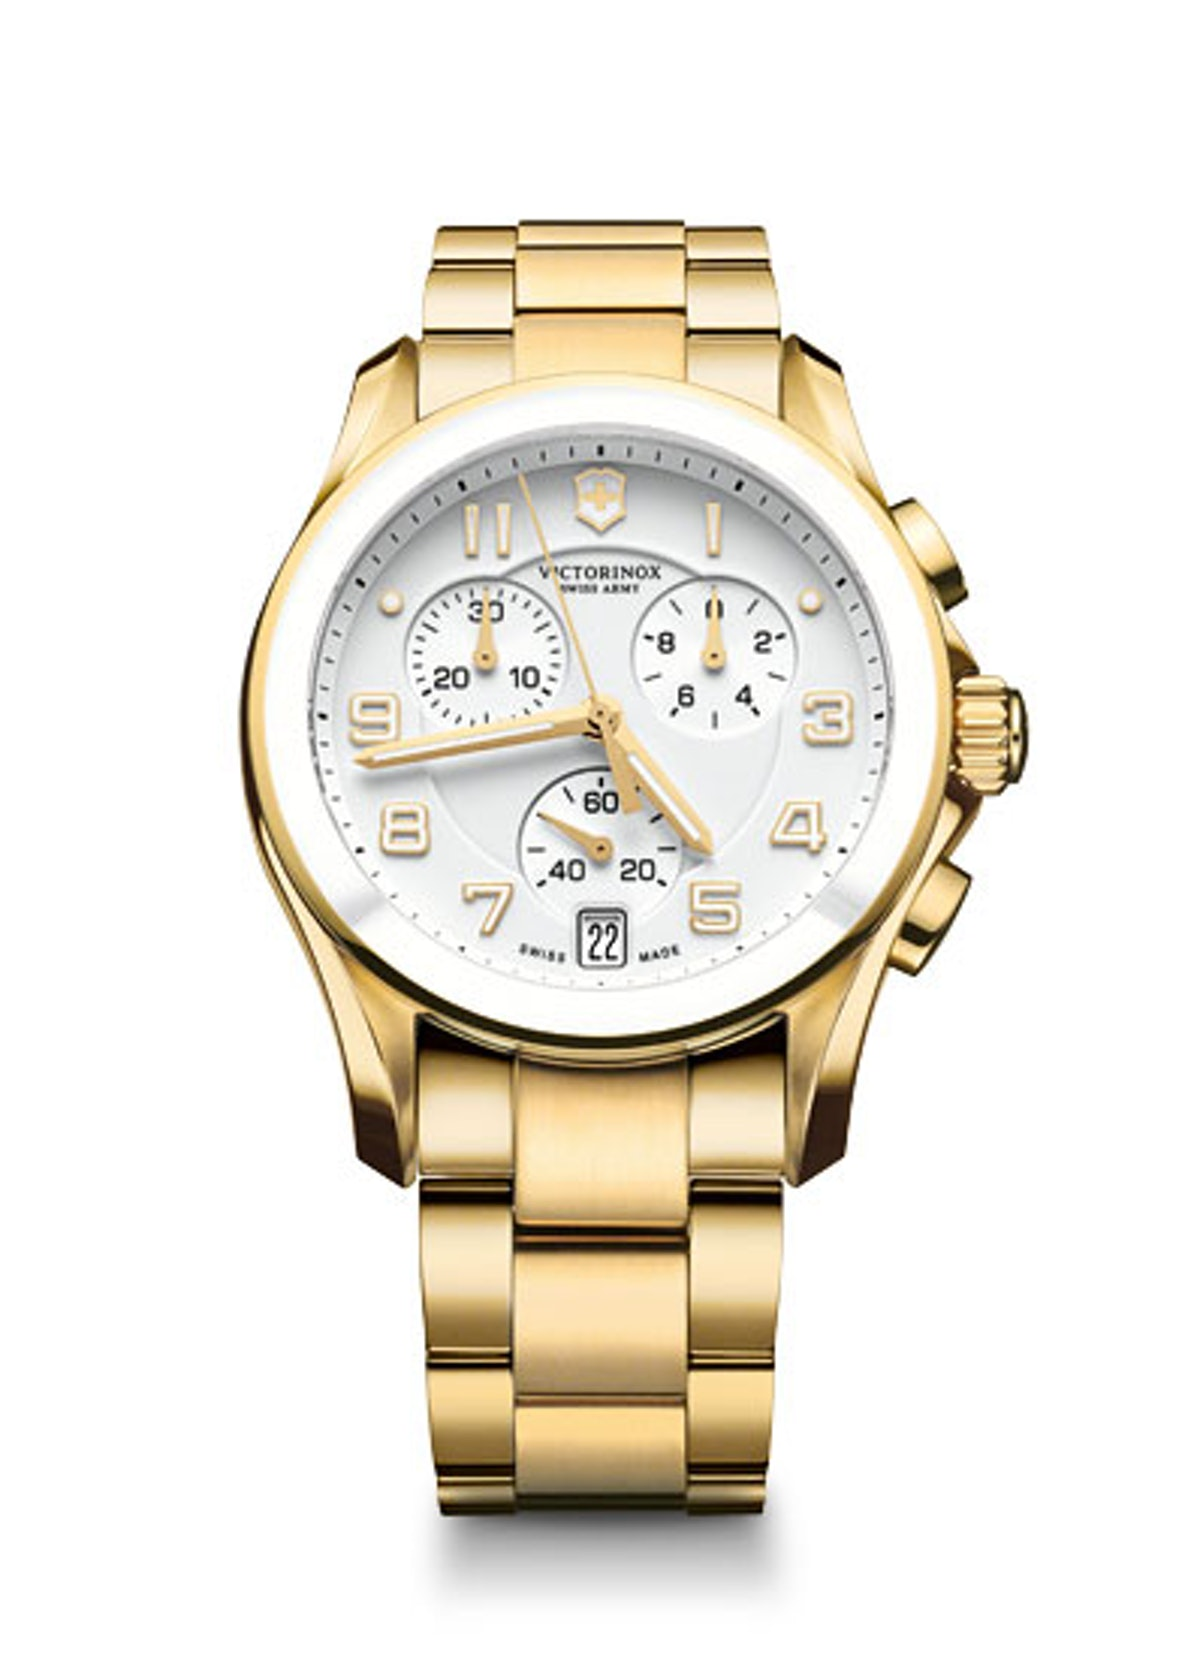 acss-basel-watches-roundup-12-v.jpg